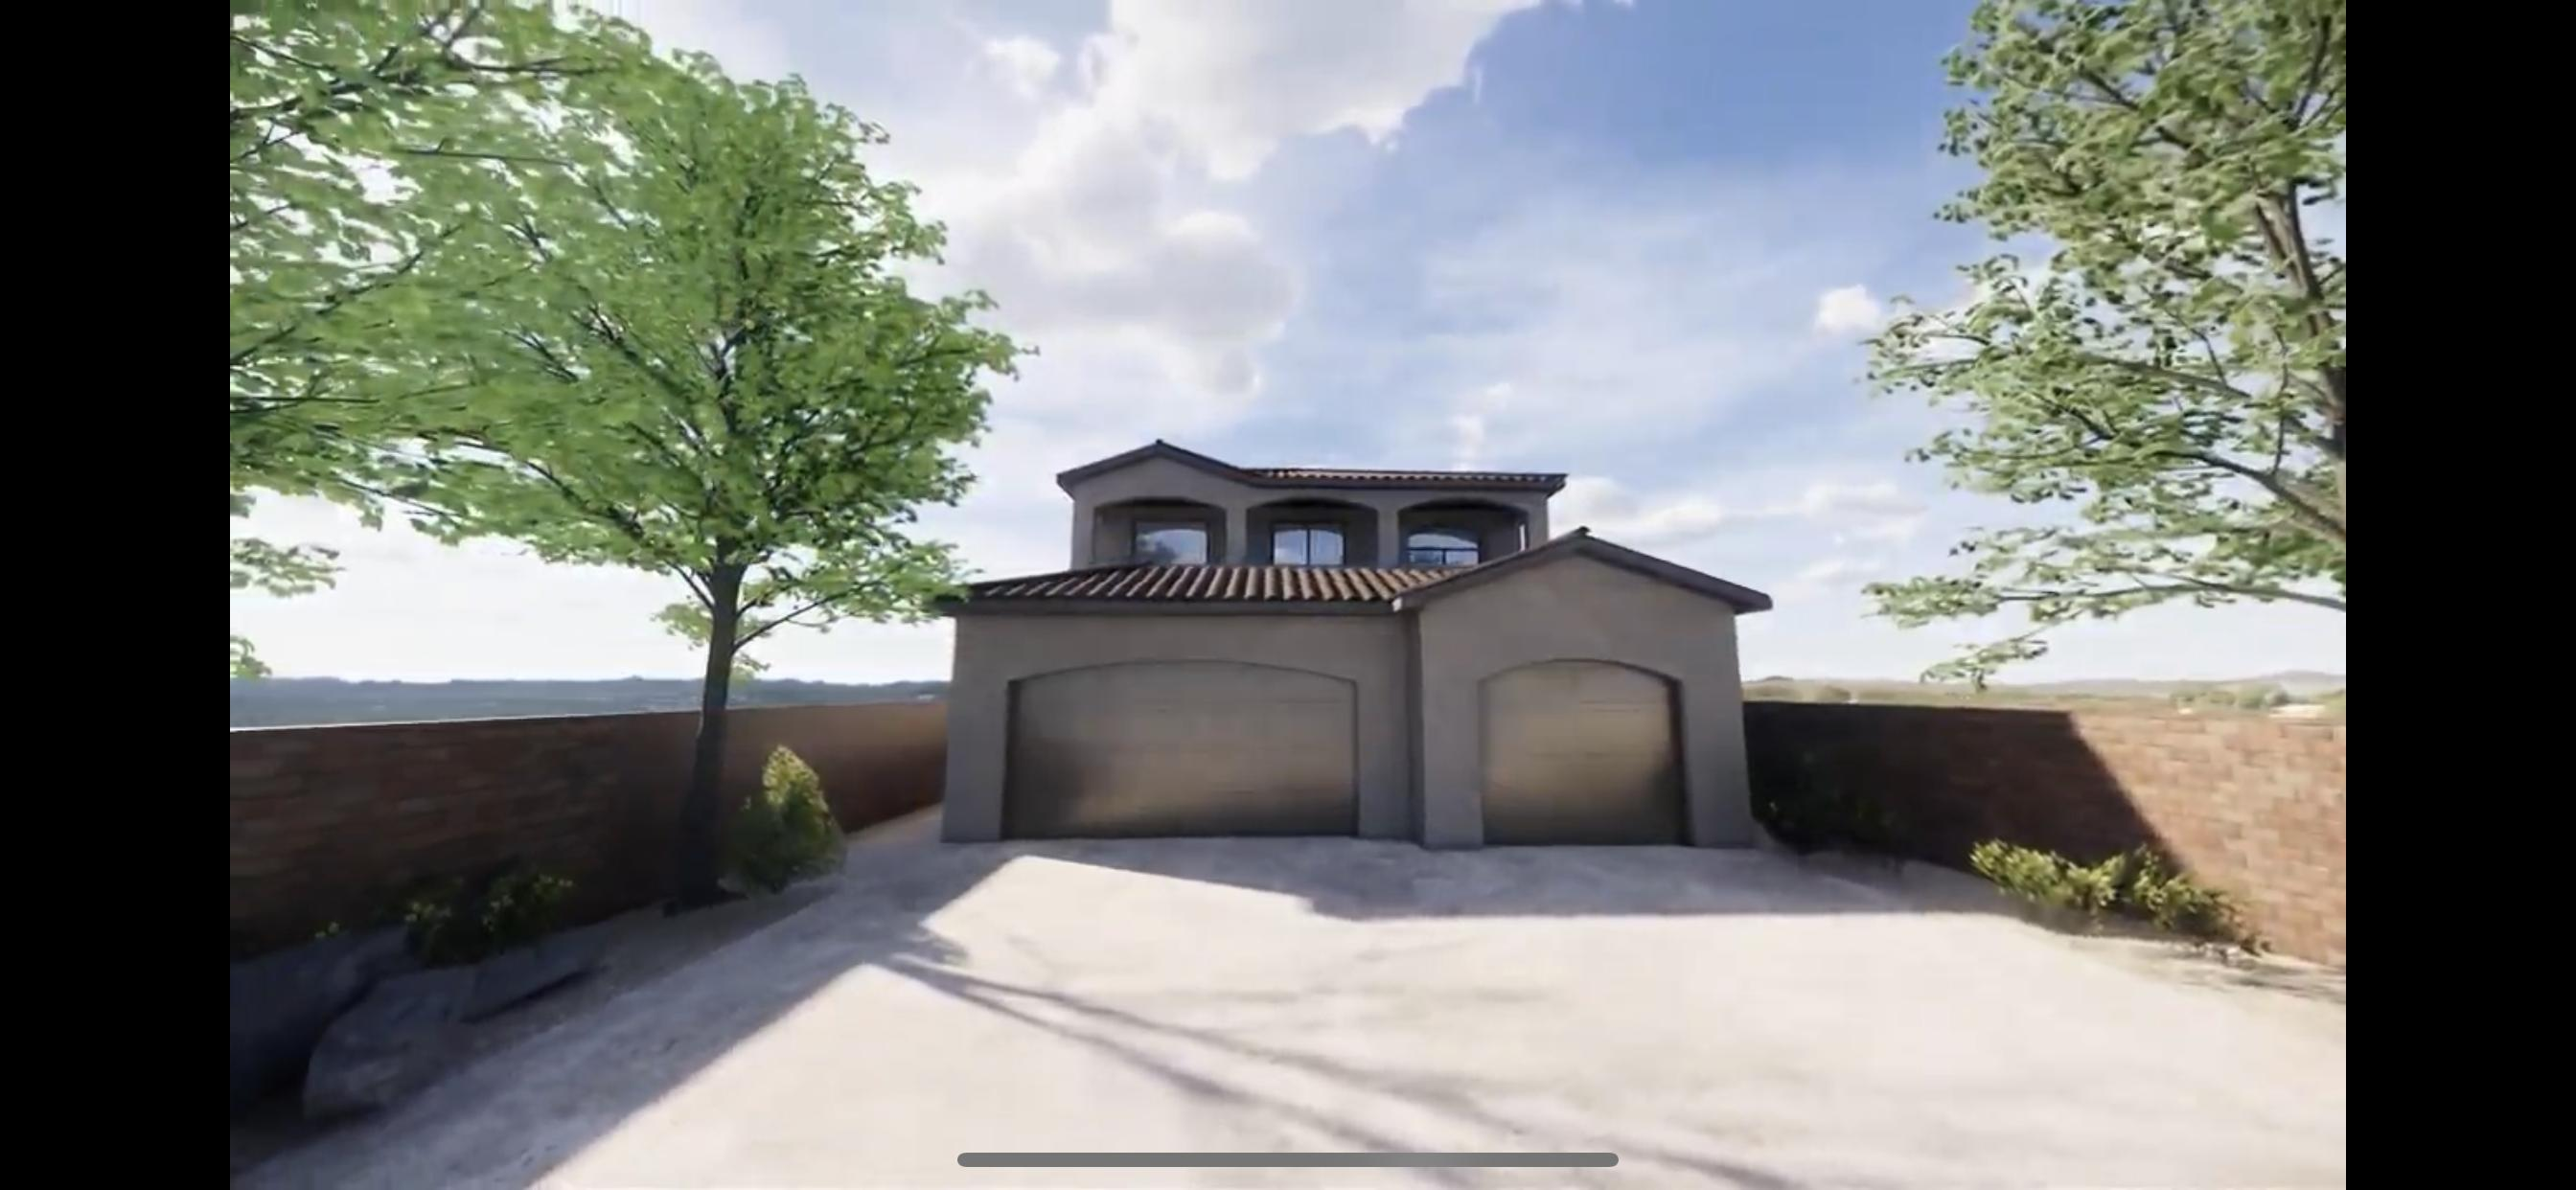 8831 SILVER OAK Lane NE, Albuquerque, NM 87113 - Albuquerque, NM real estate listing